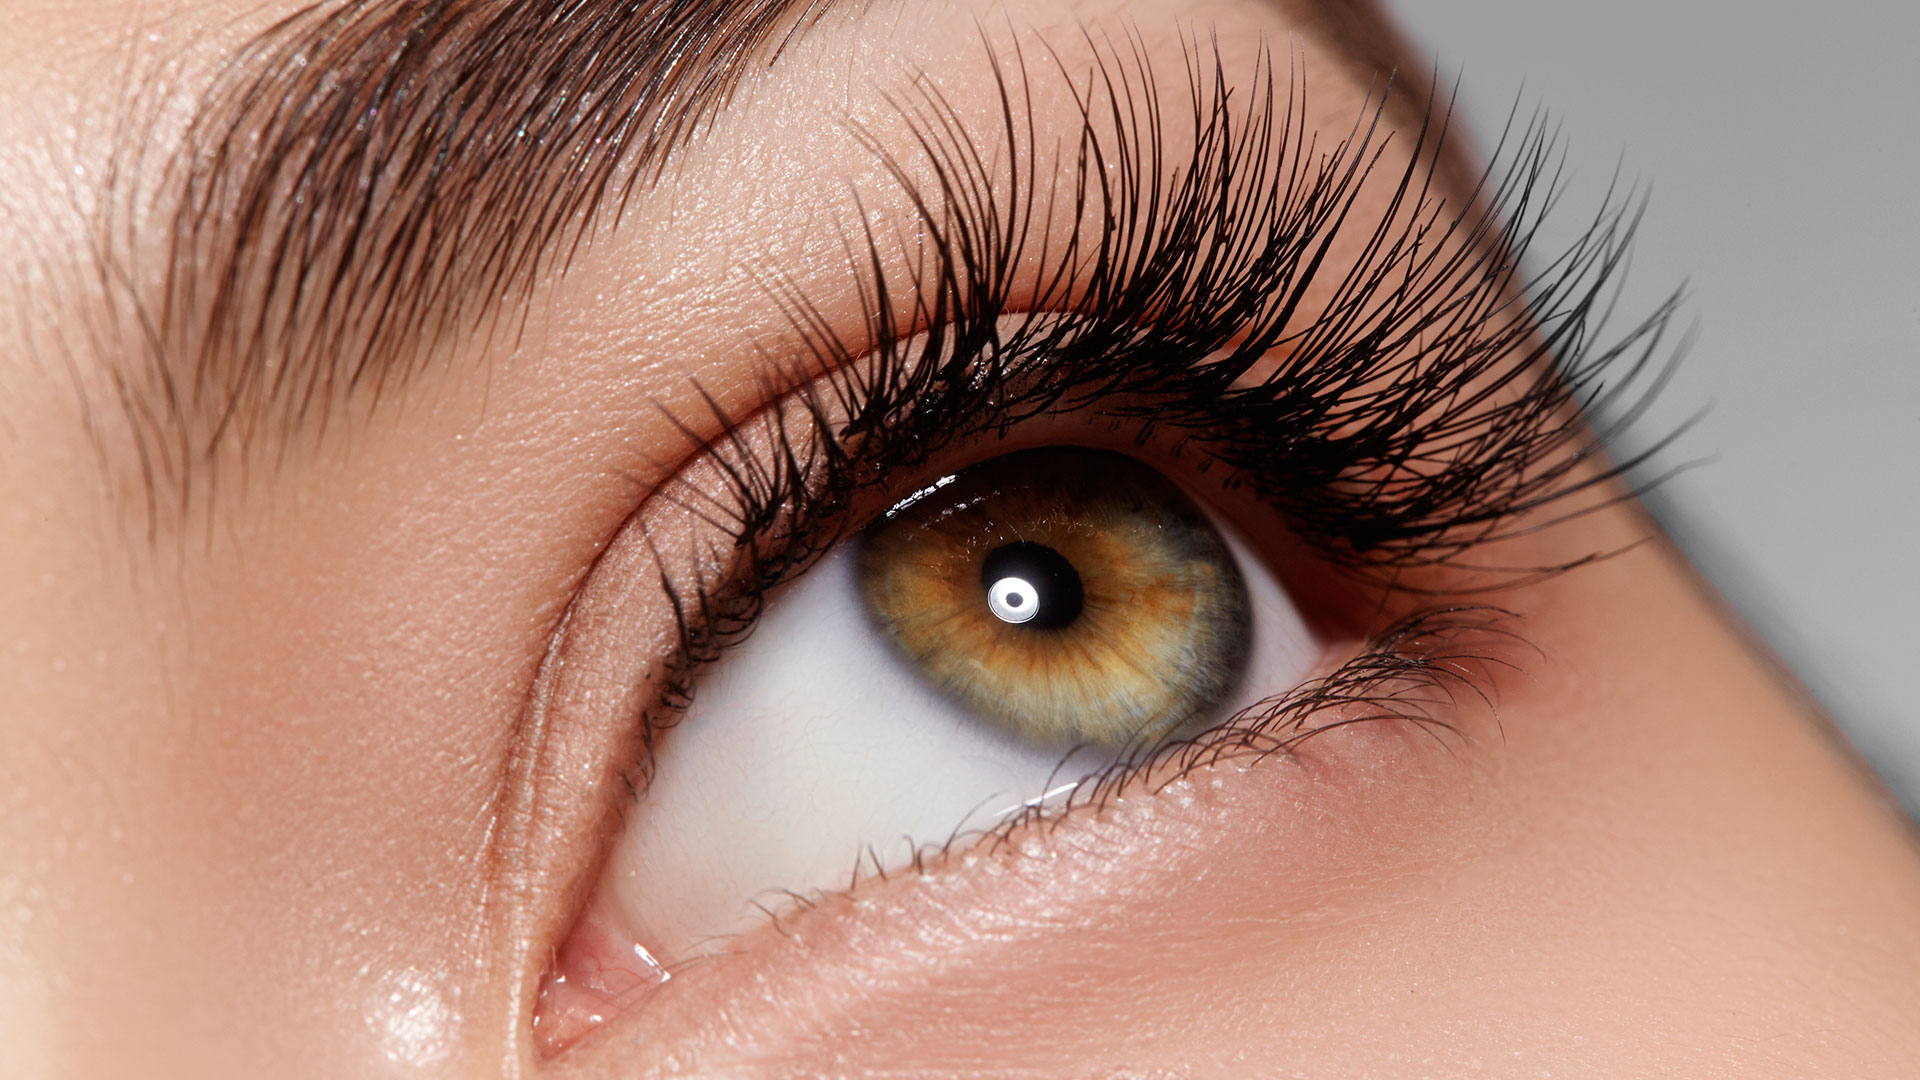 c4b177f7ac3 Eye and Brow treatments | S66. Beauty Skin Clinic. Wickersley ...